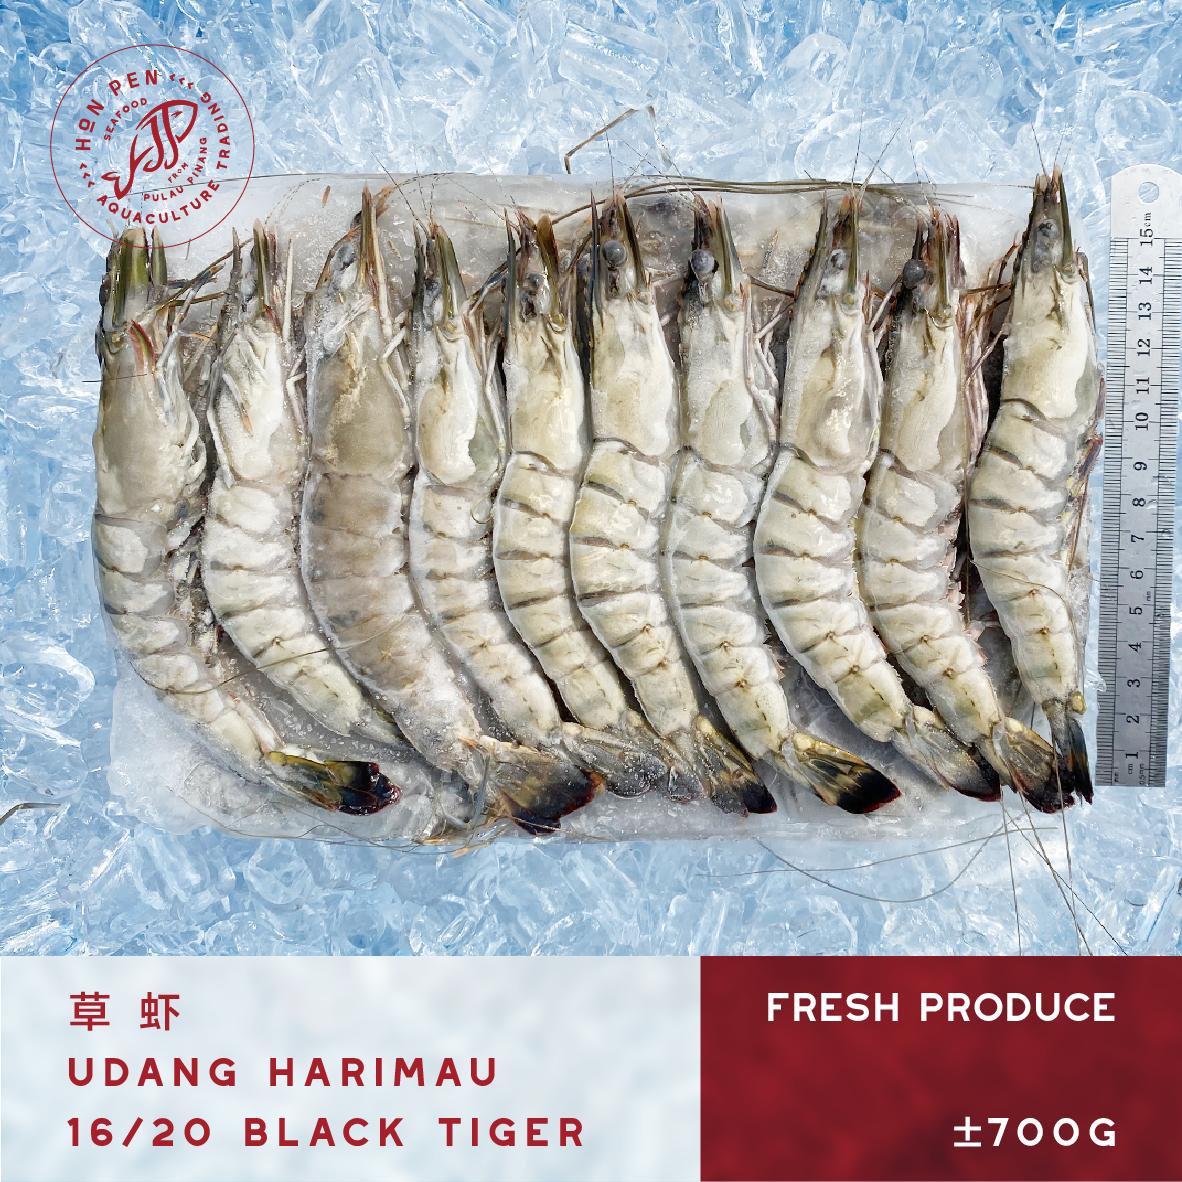 BLACK TIGER 16/20 草虾 UDANG HARIMAU (Seafood) ±700g